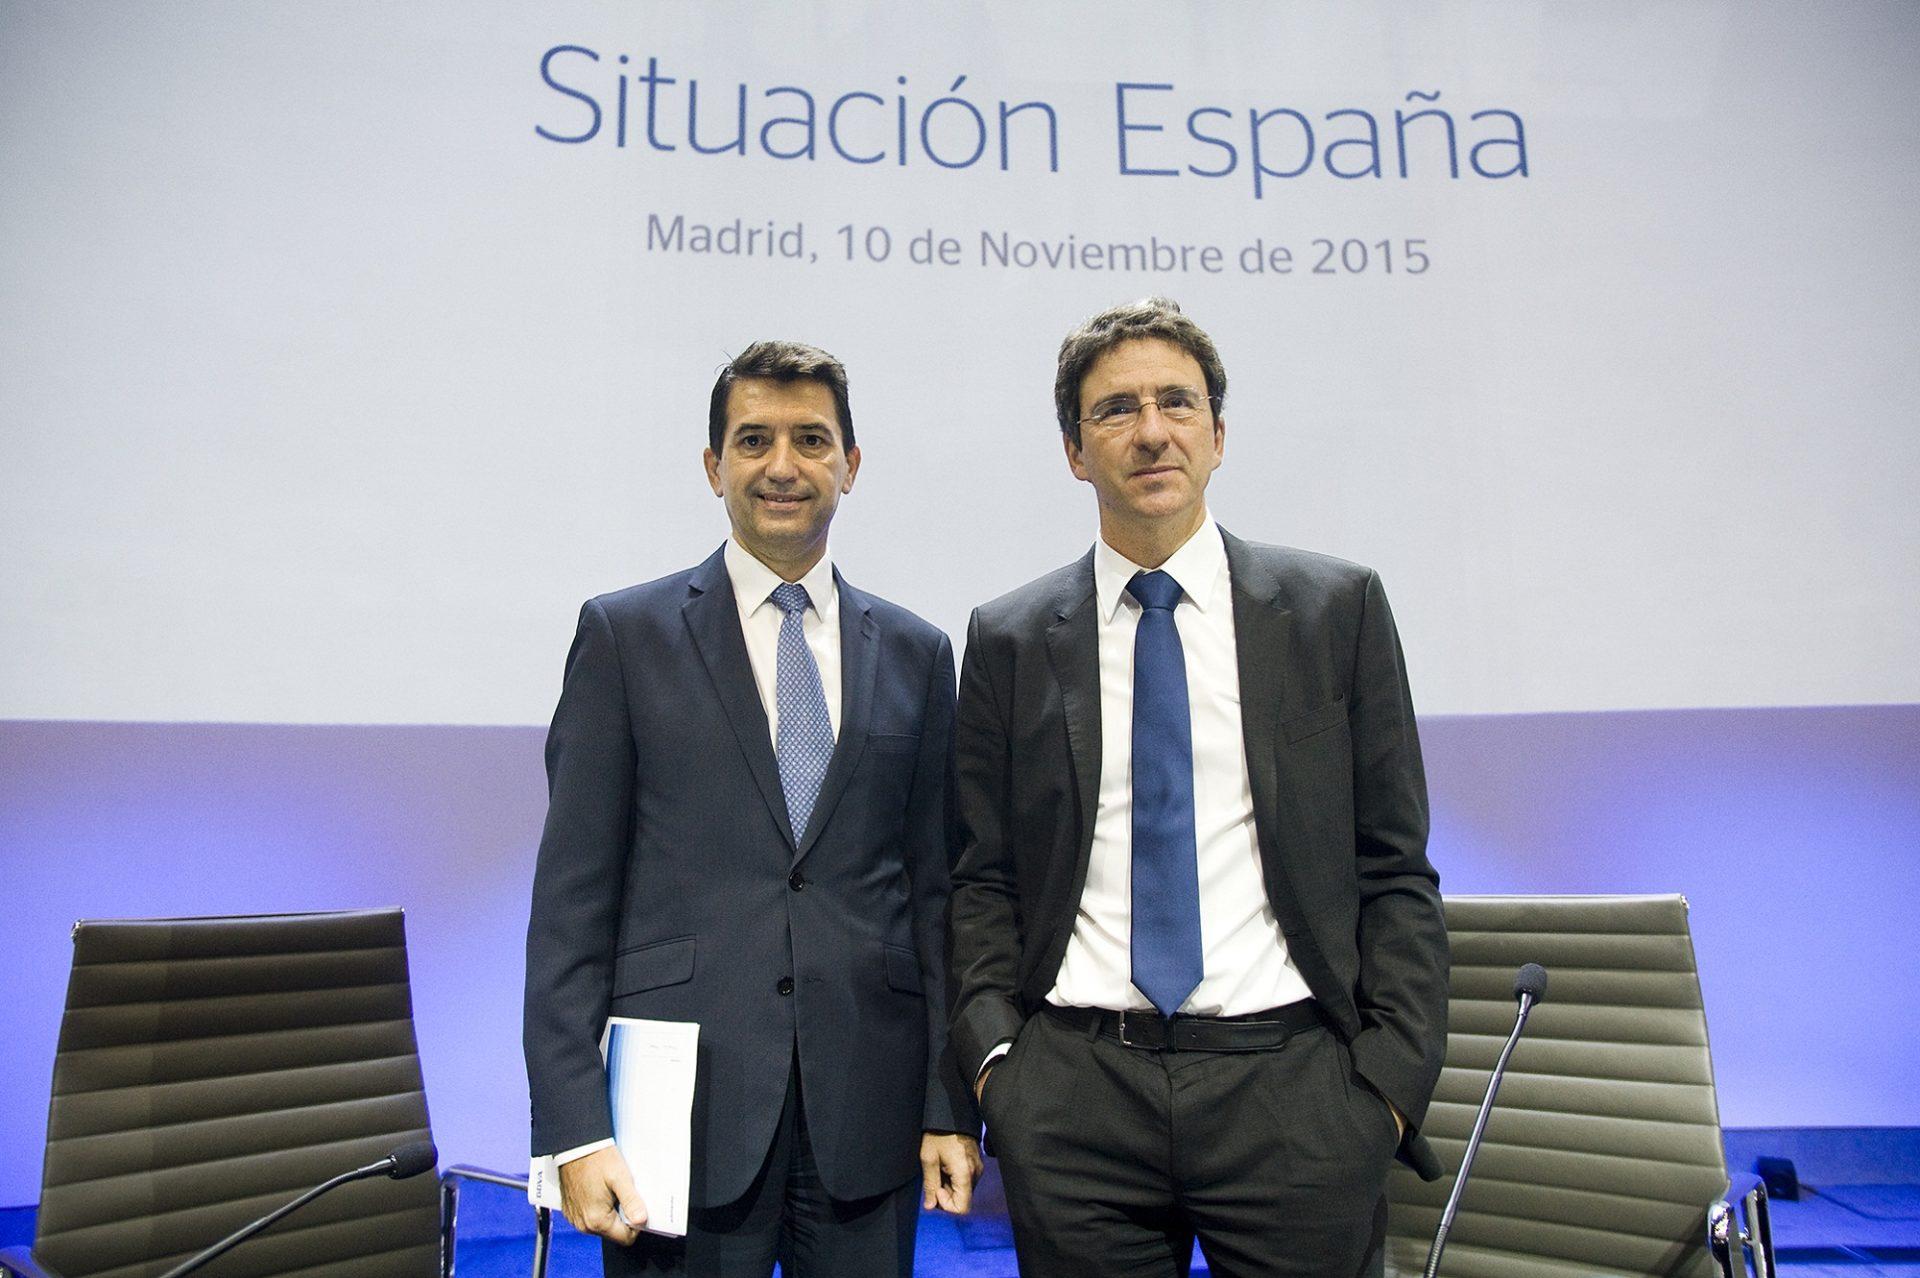 Rafael Domenech and Jorge Sicilia Spain economic outlook presentation